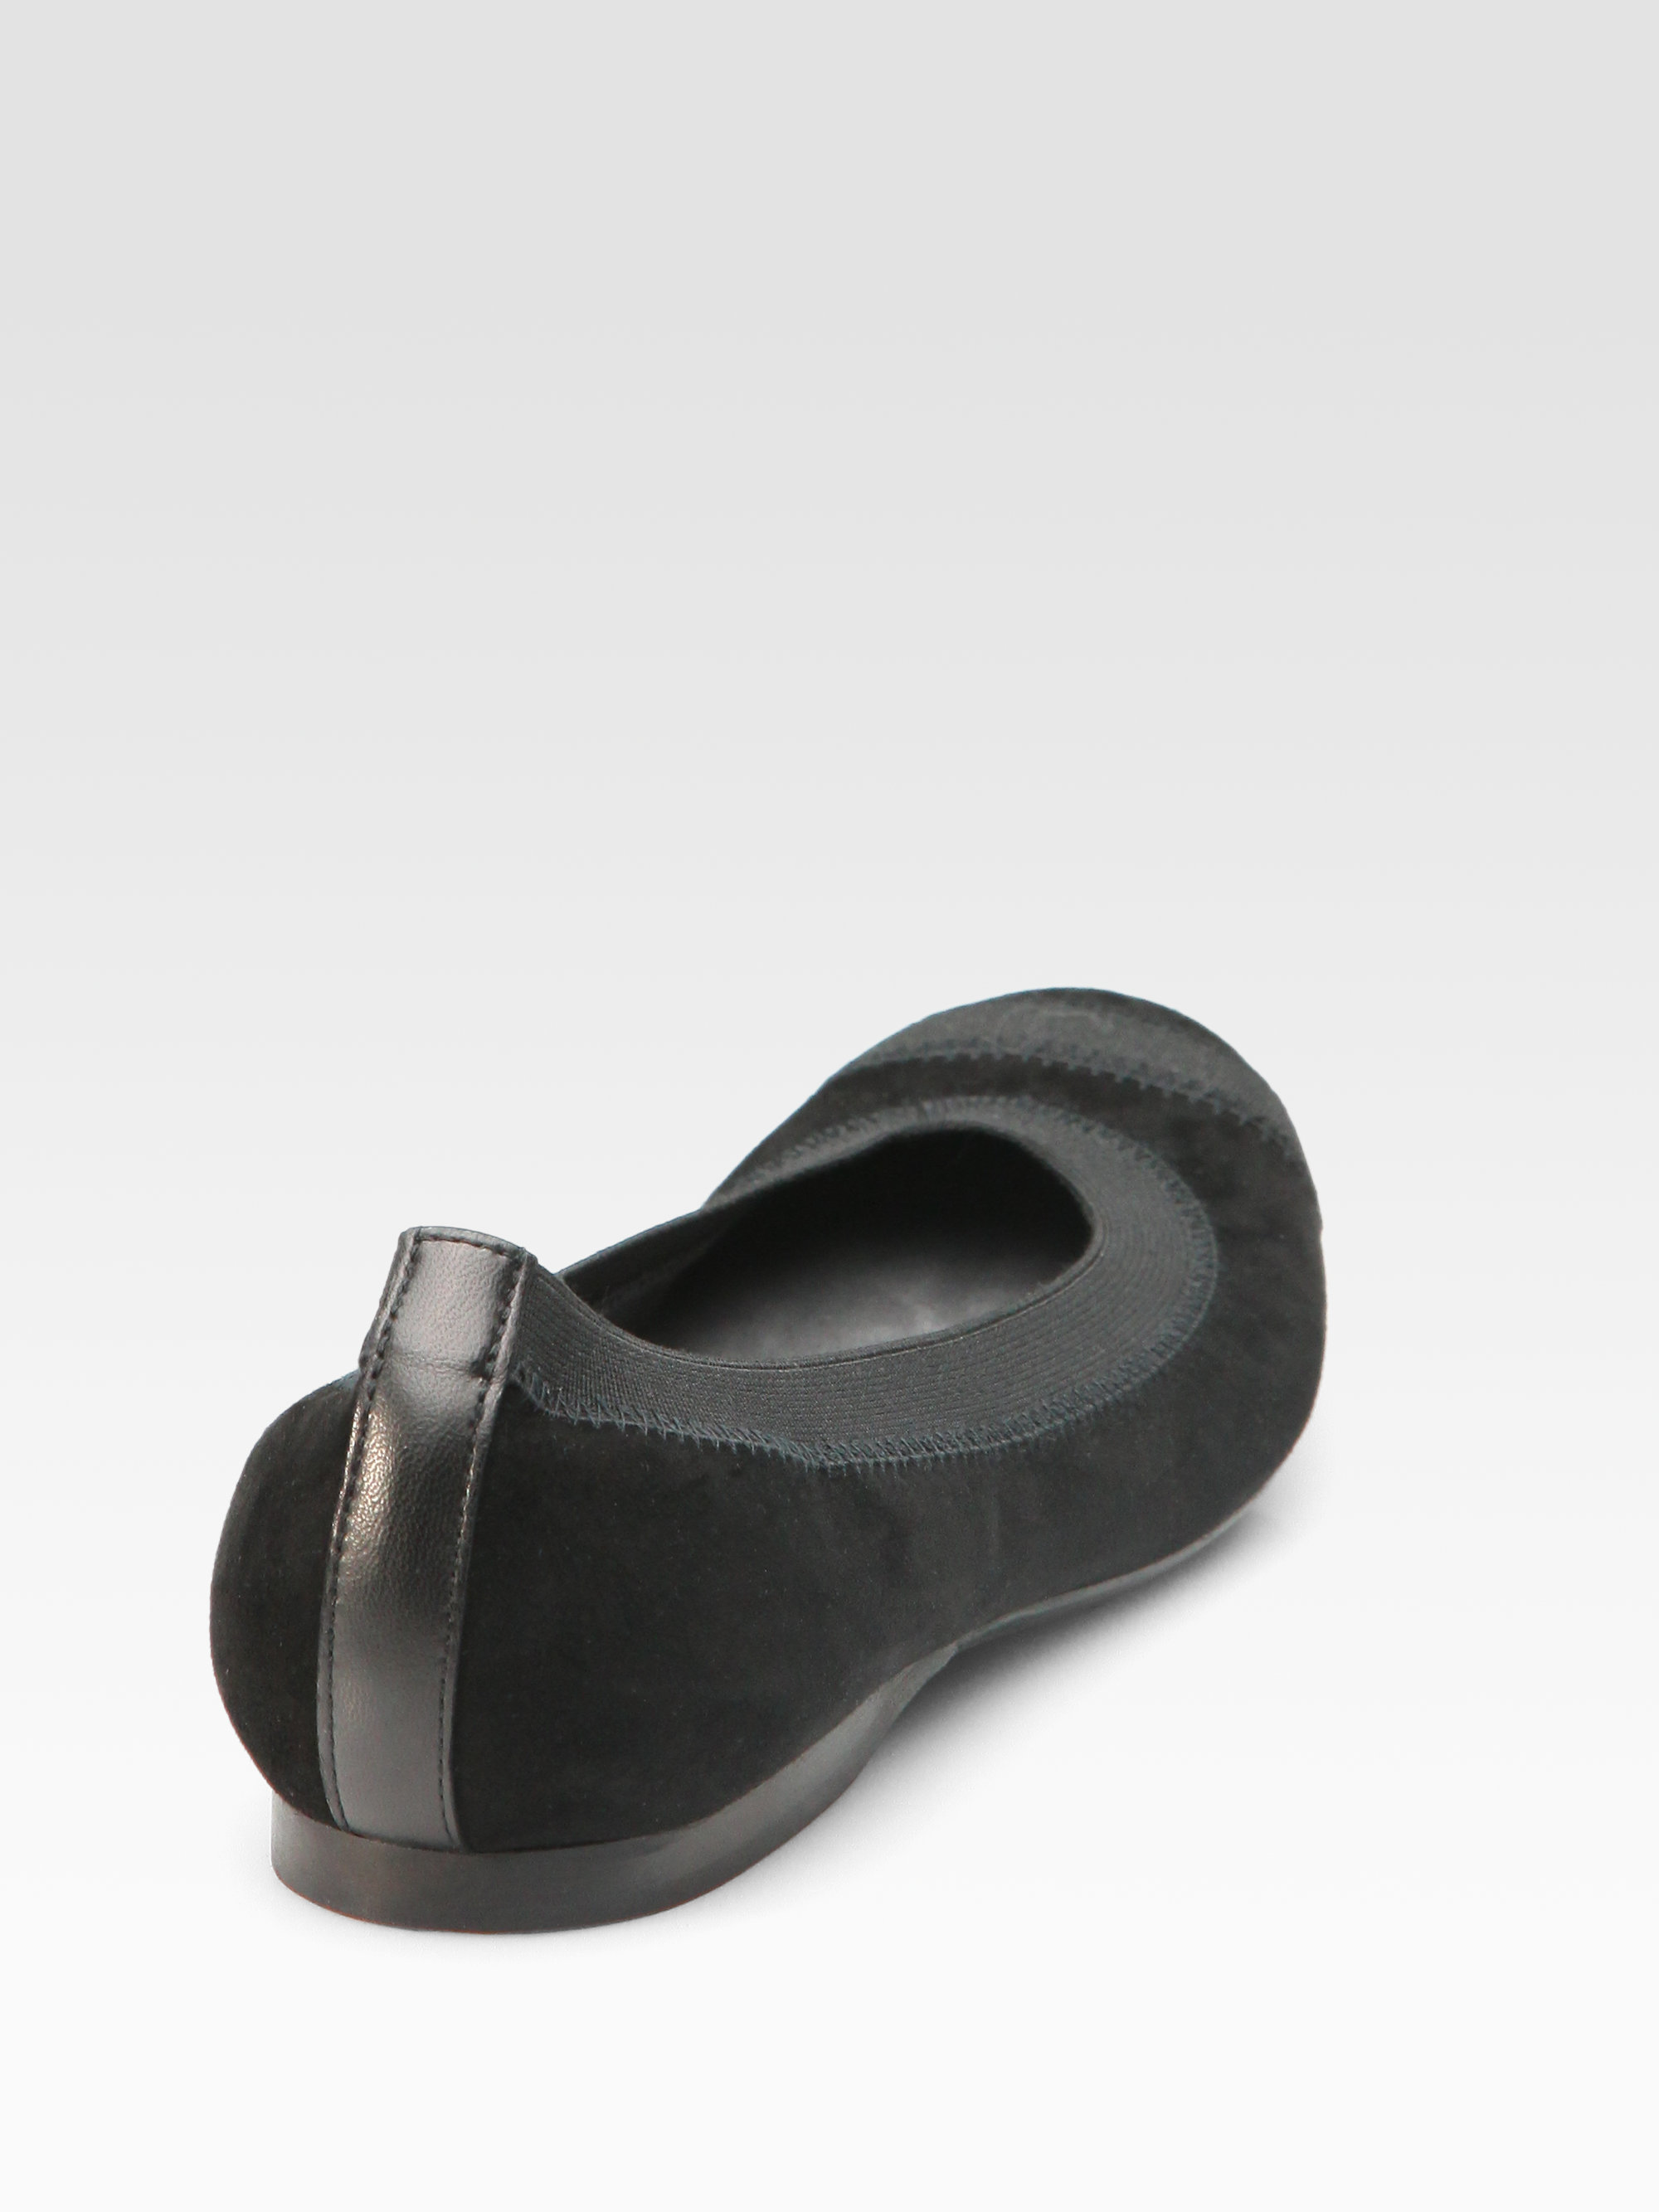 c86264186a5 Lyst - Stuart Weitzman Giveable Suede Ballet Flats in Black